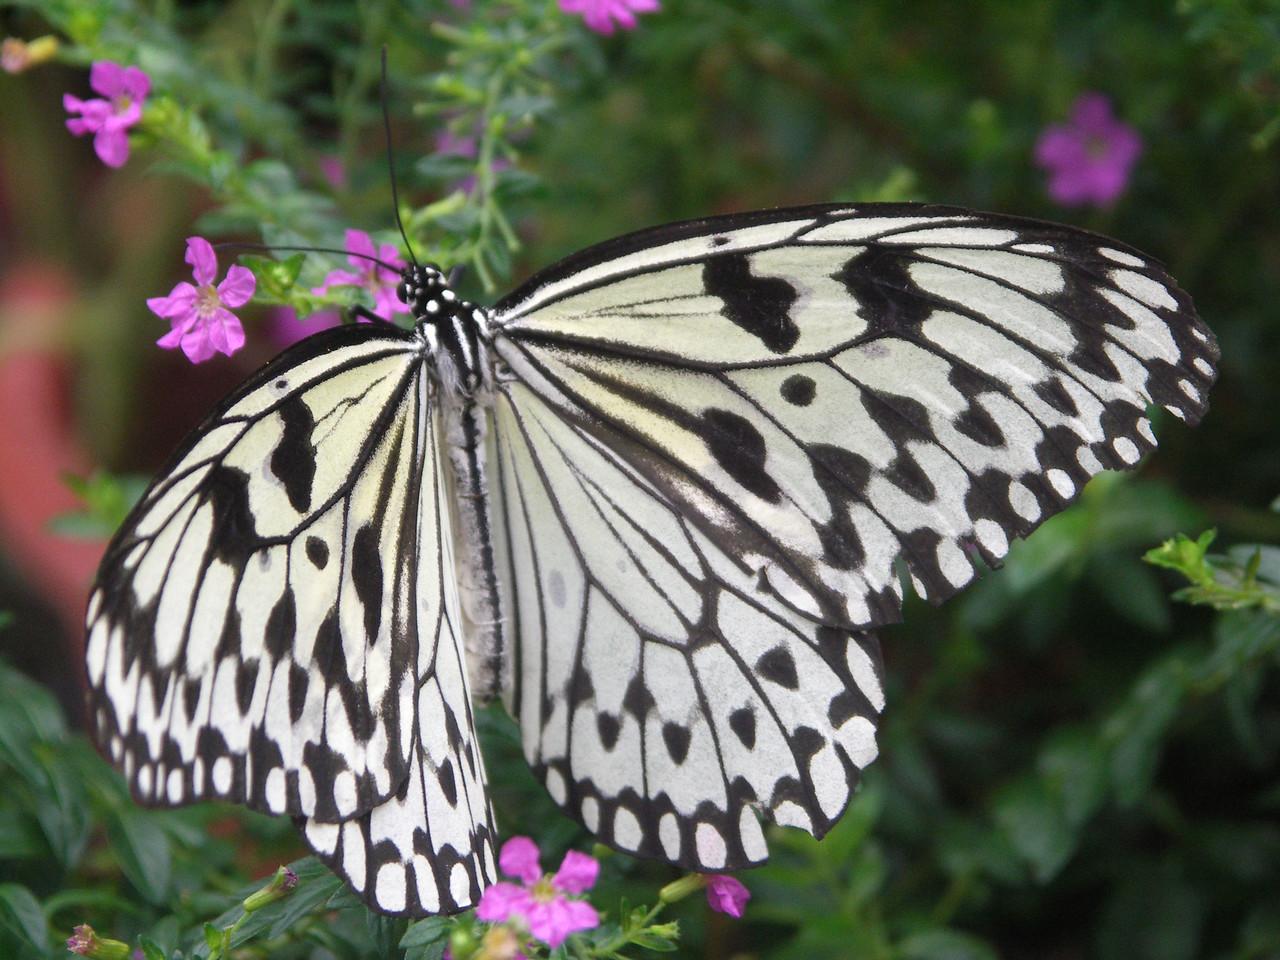 Penang Butterfly Farm, Malaysia